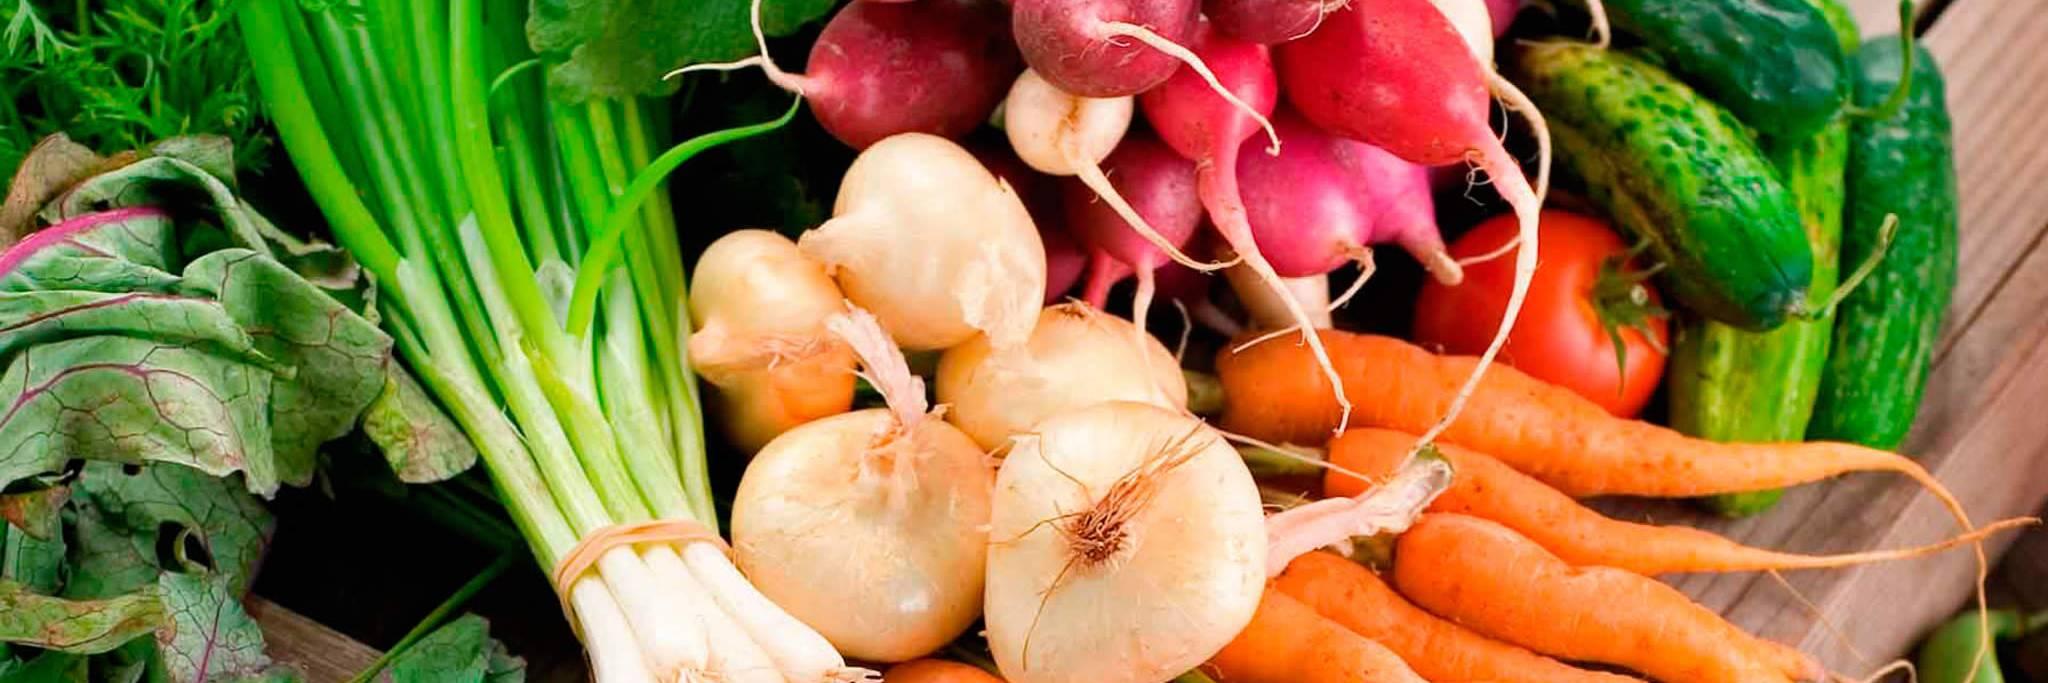 Enjoy fresh local produce from Ayrshire